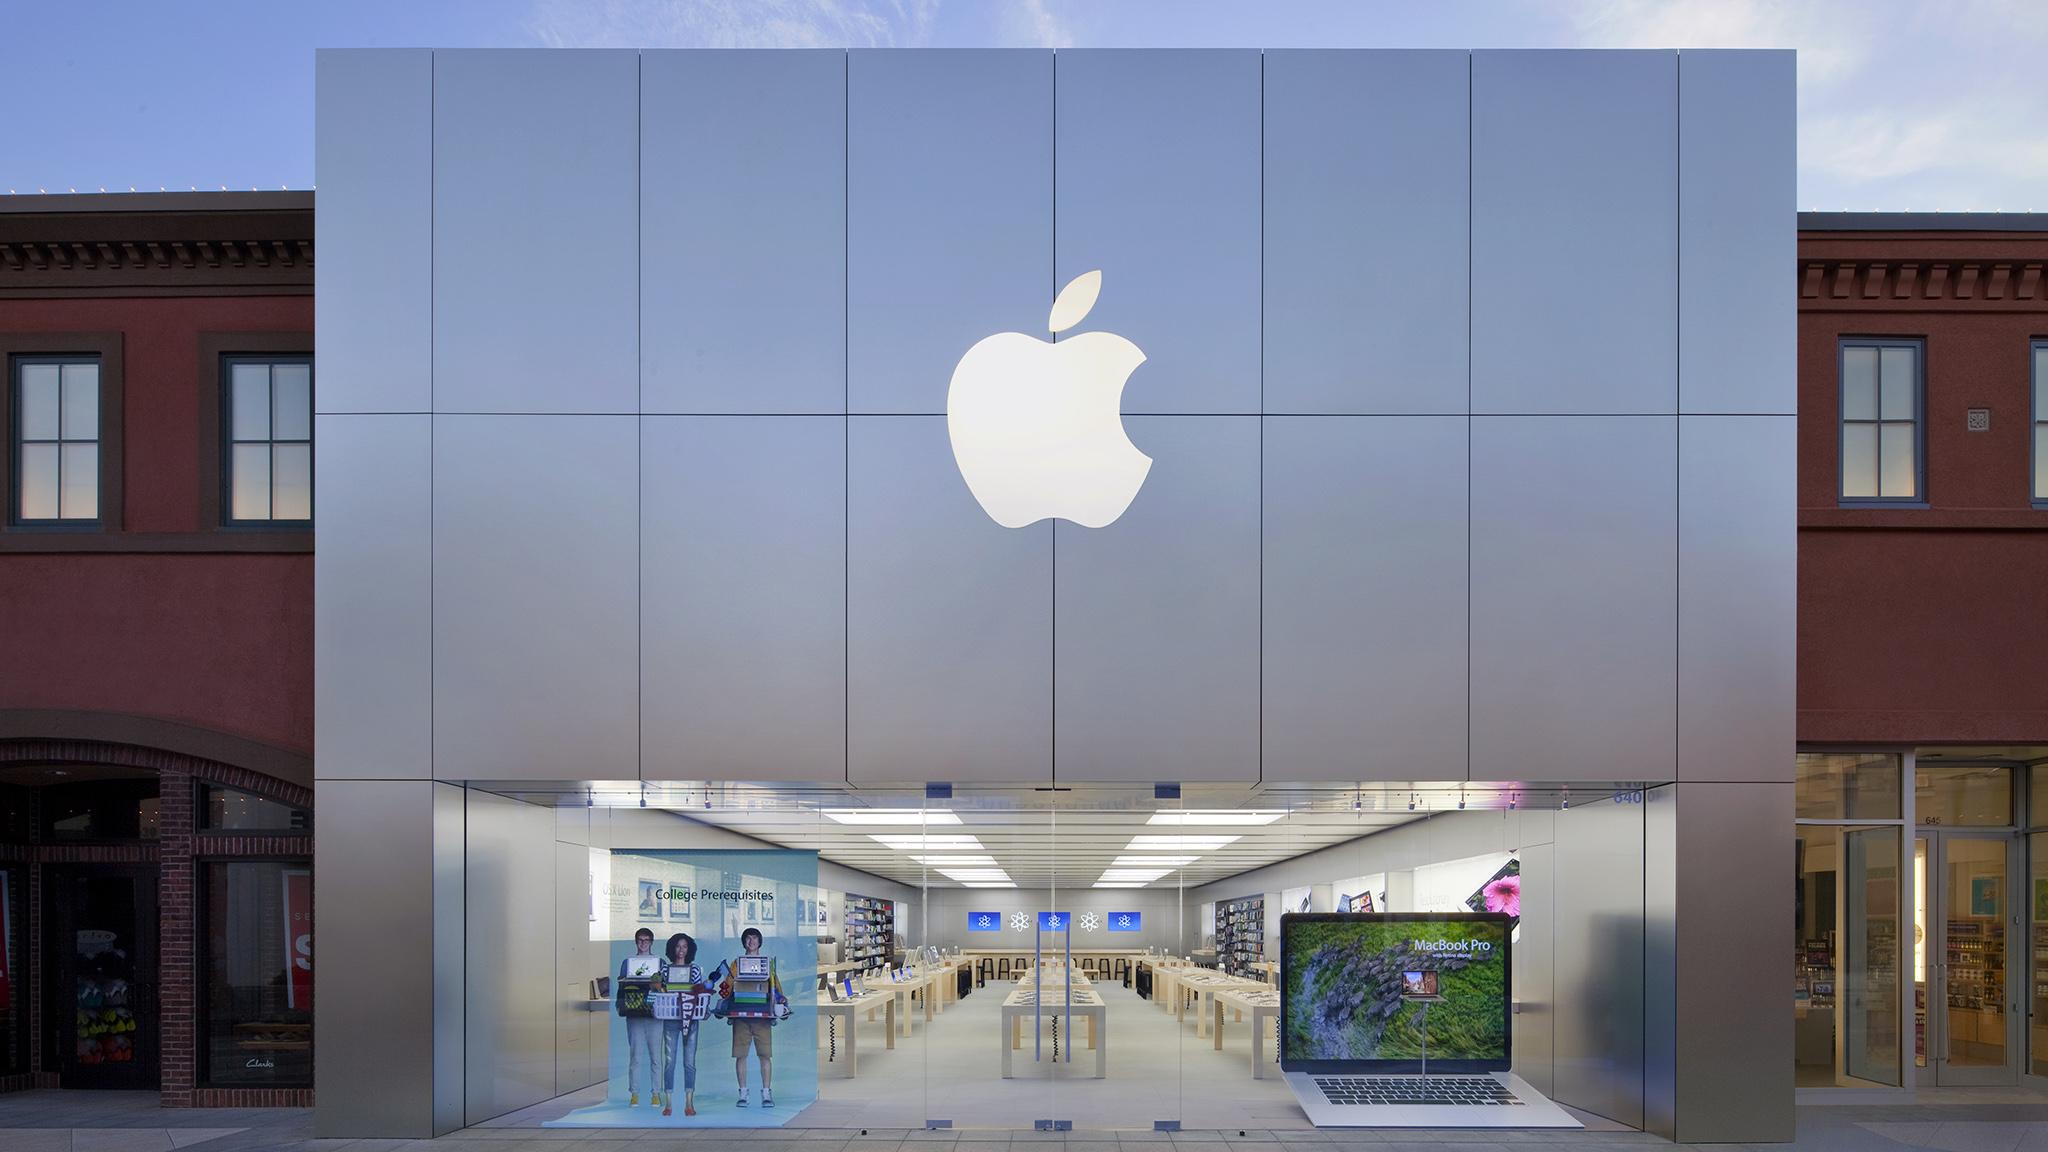 Apple Mall of Louisiana image 0